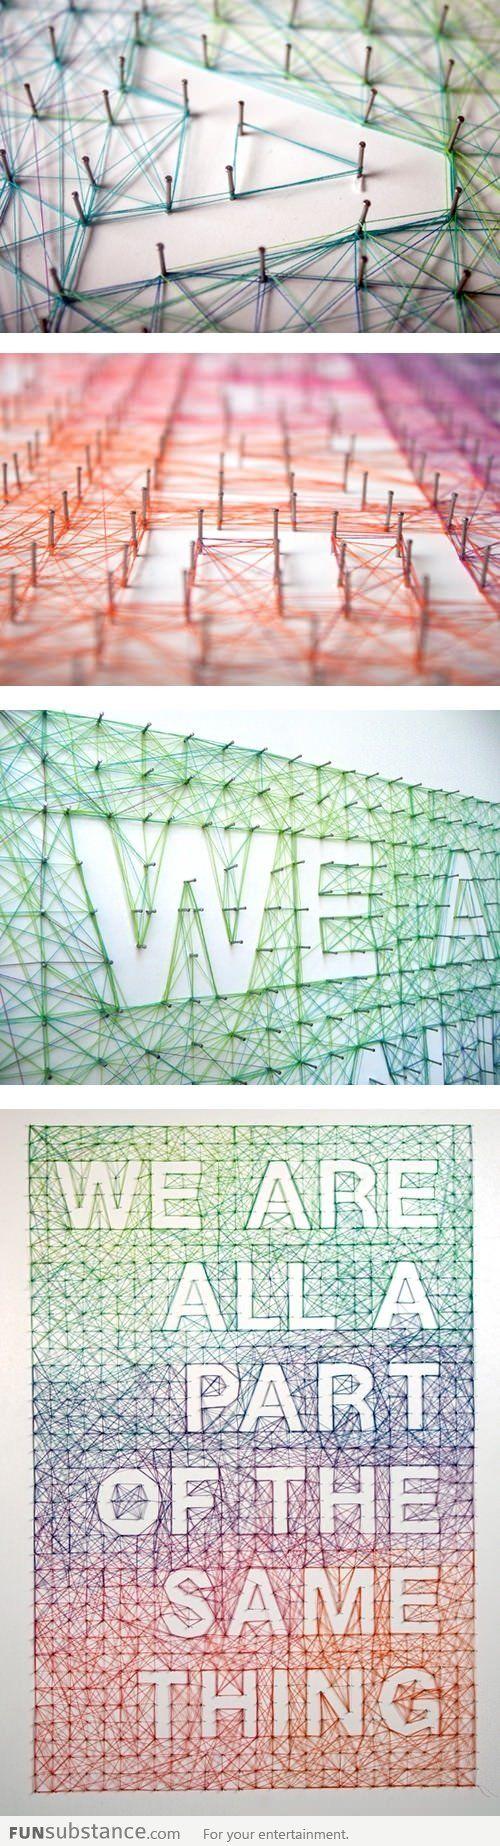 Gaaf! Maak je eigen touwtjes kunst #interieur #kunst #doityourself #art #home #idea